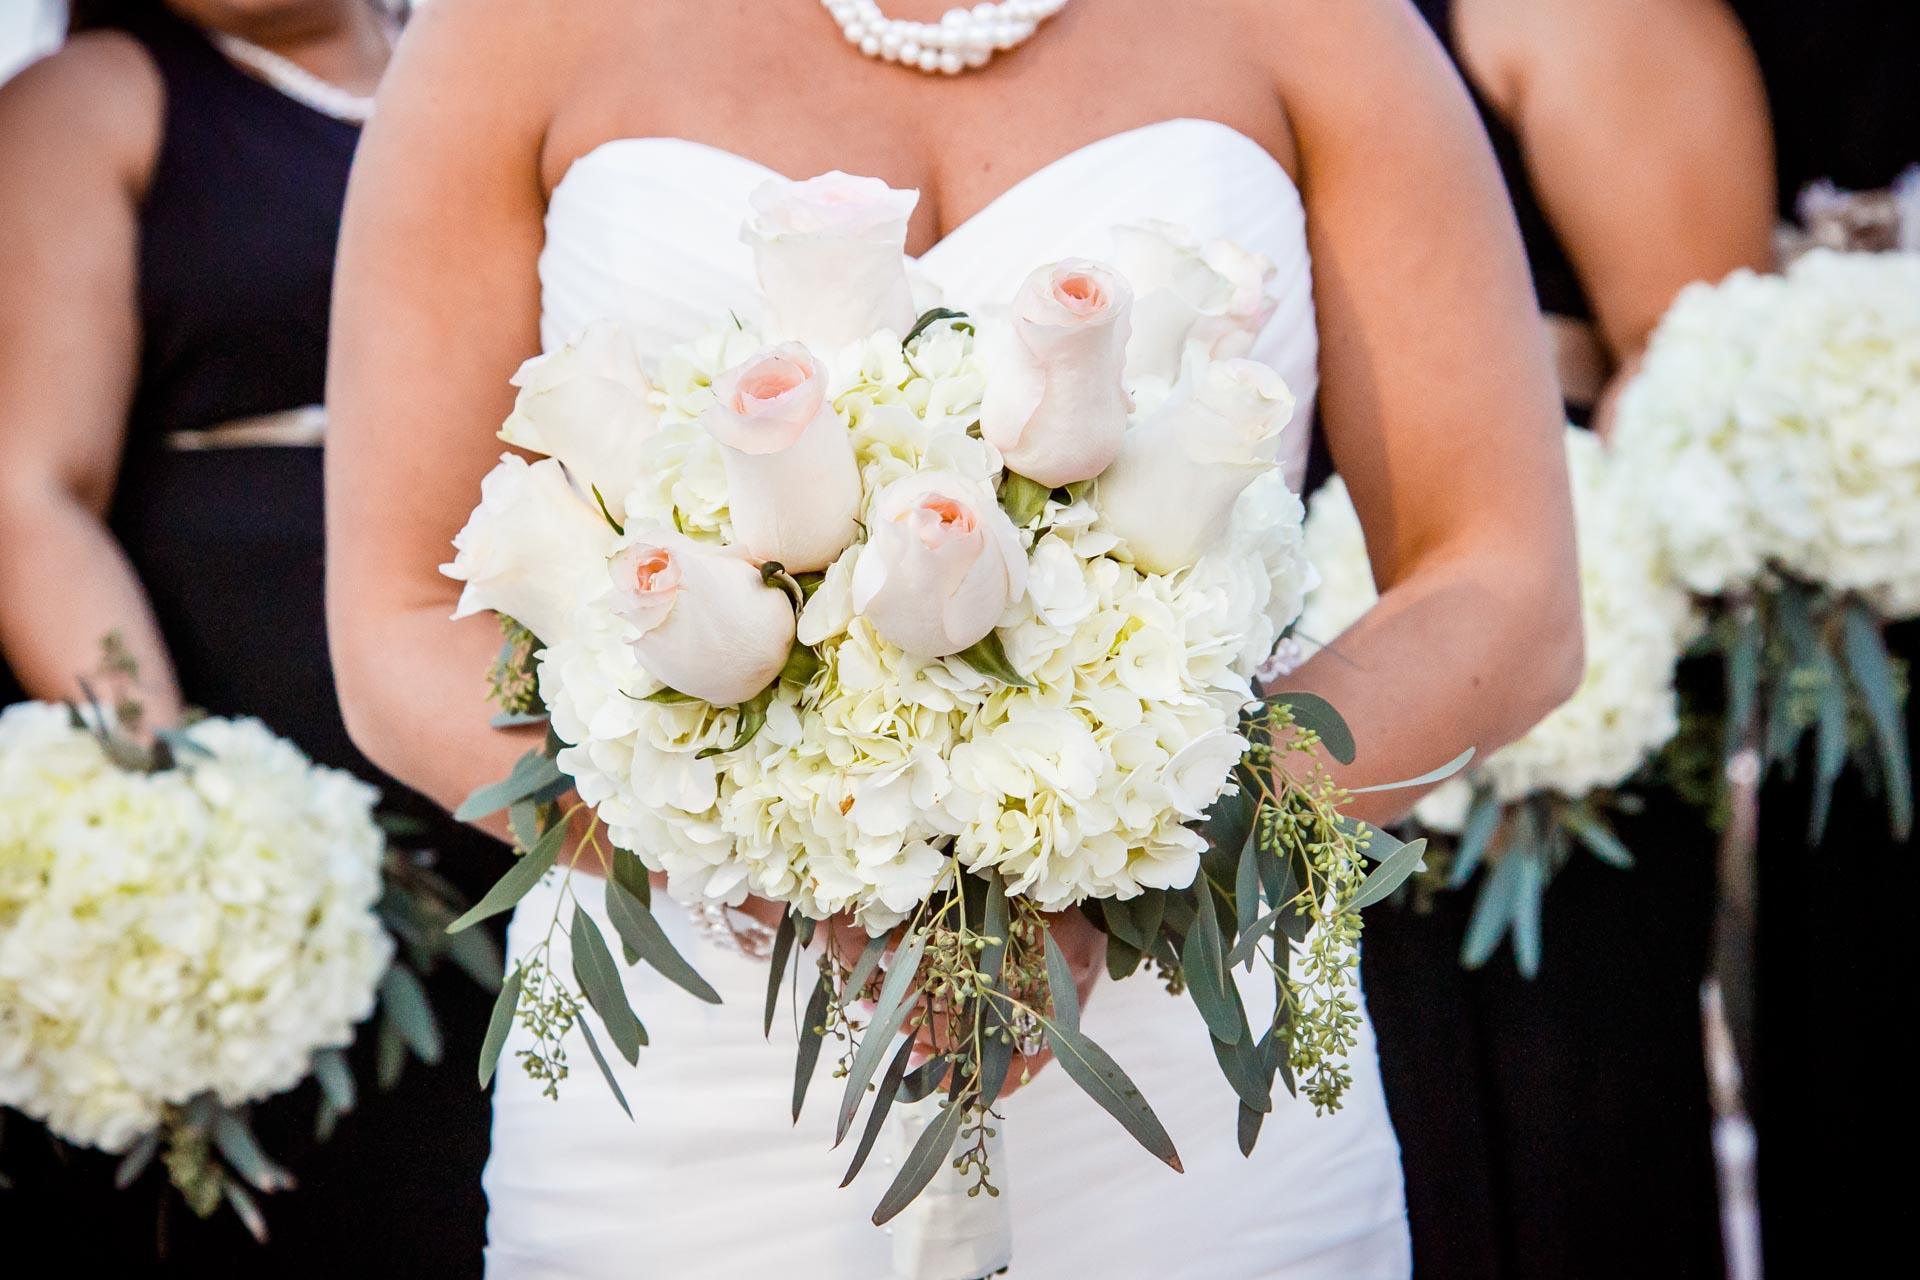 wedding-2-adam-shea-photography-green-bay-appleton-neenah-photographer-26.jpg